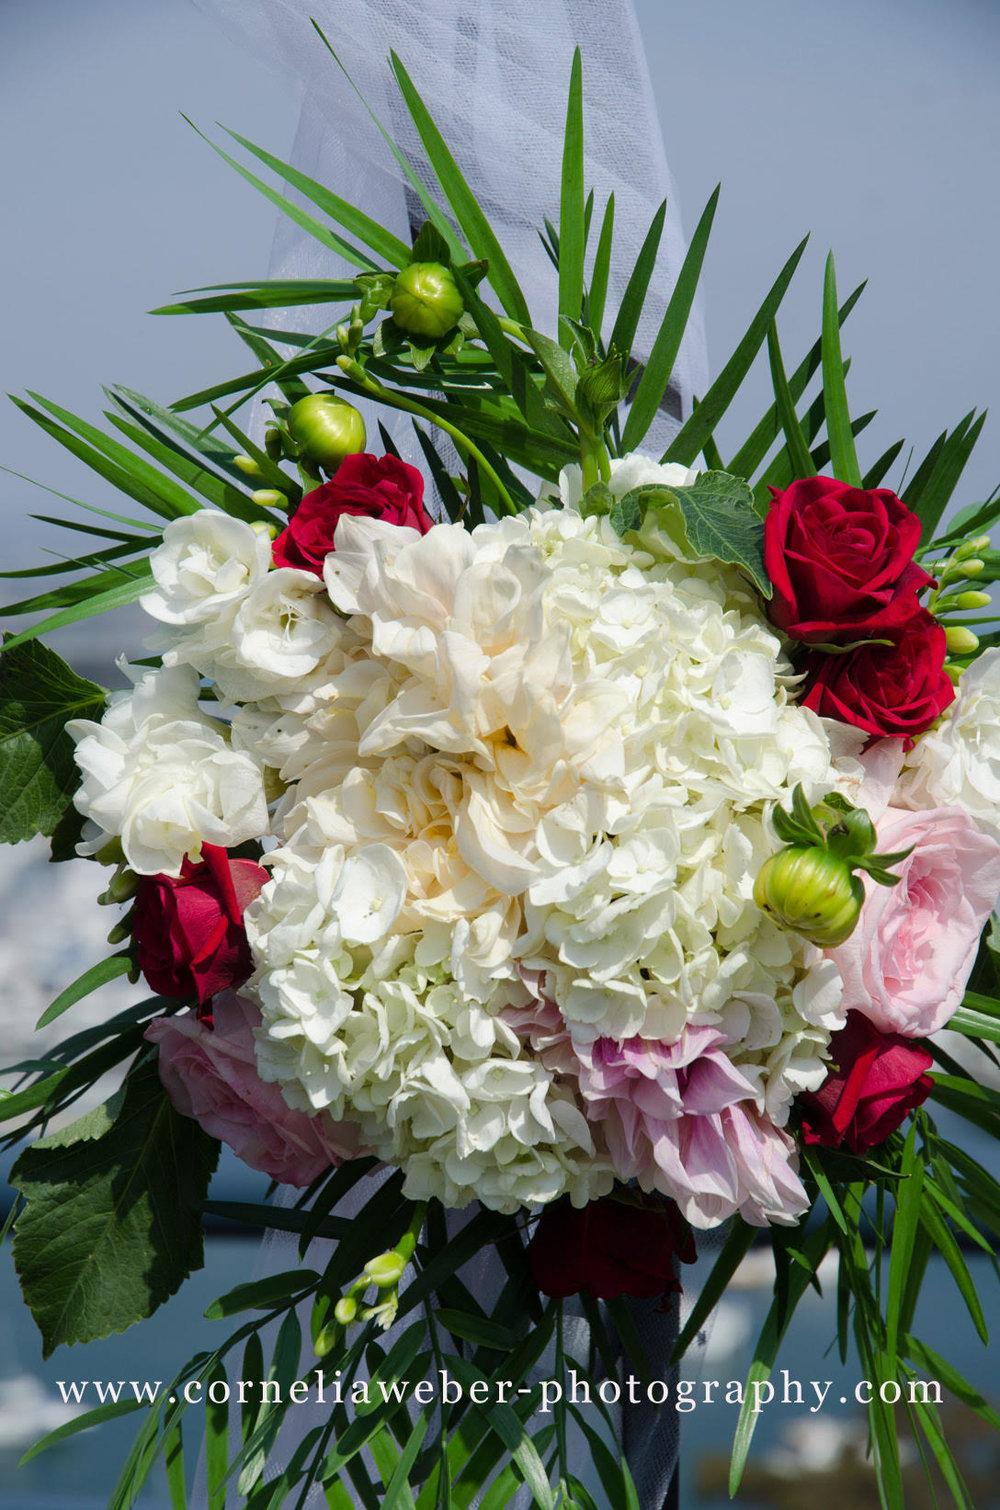 Affi_Darren_wedding_flowers_1.jpg